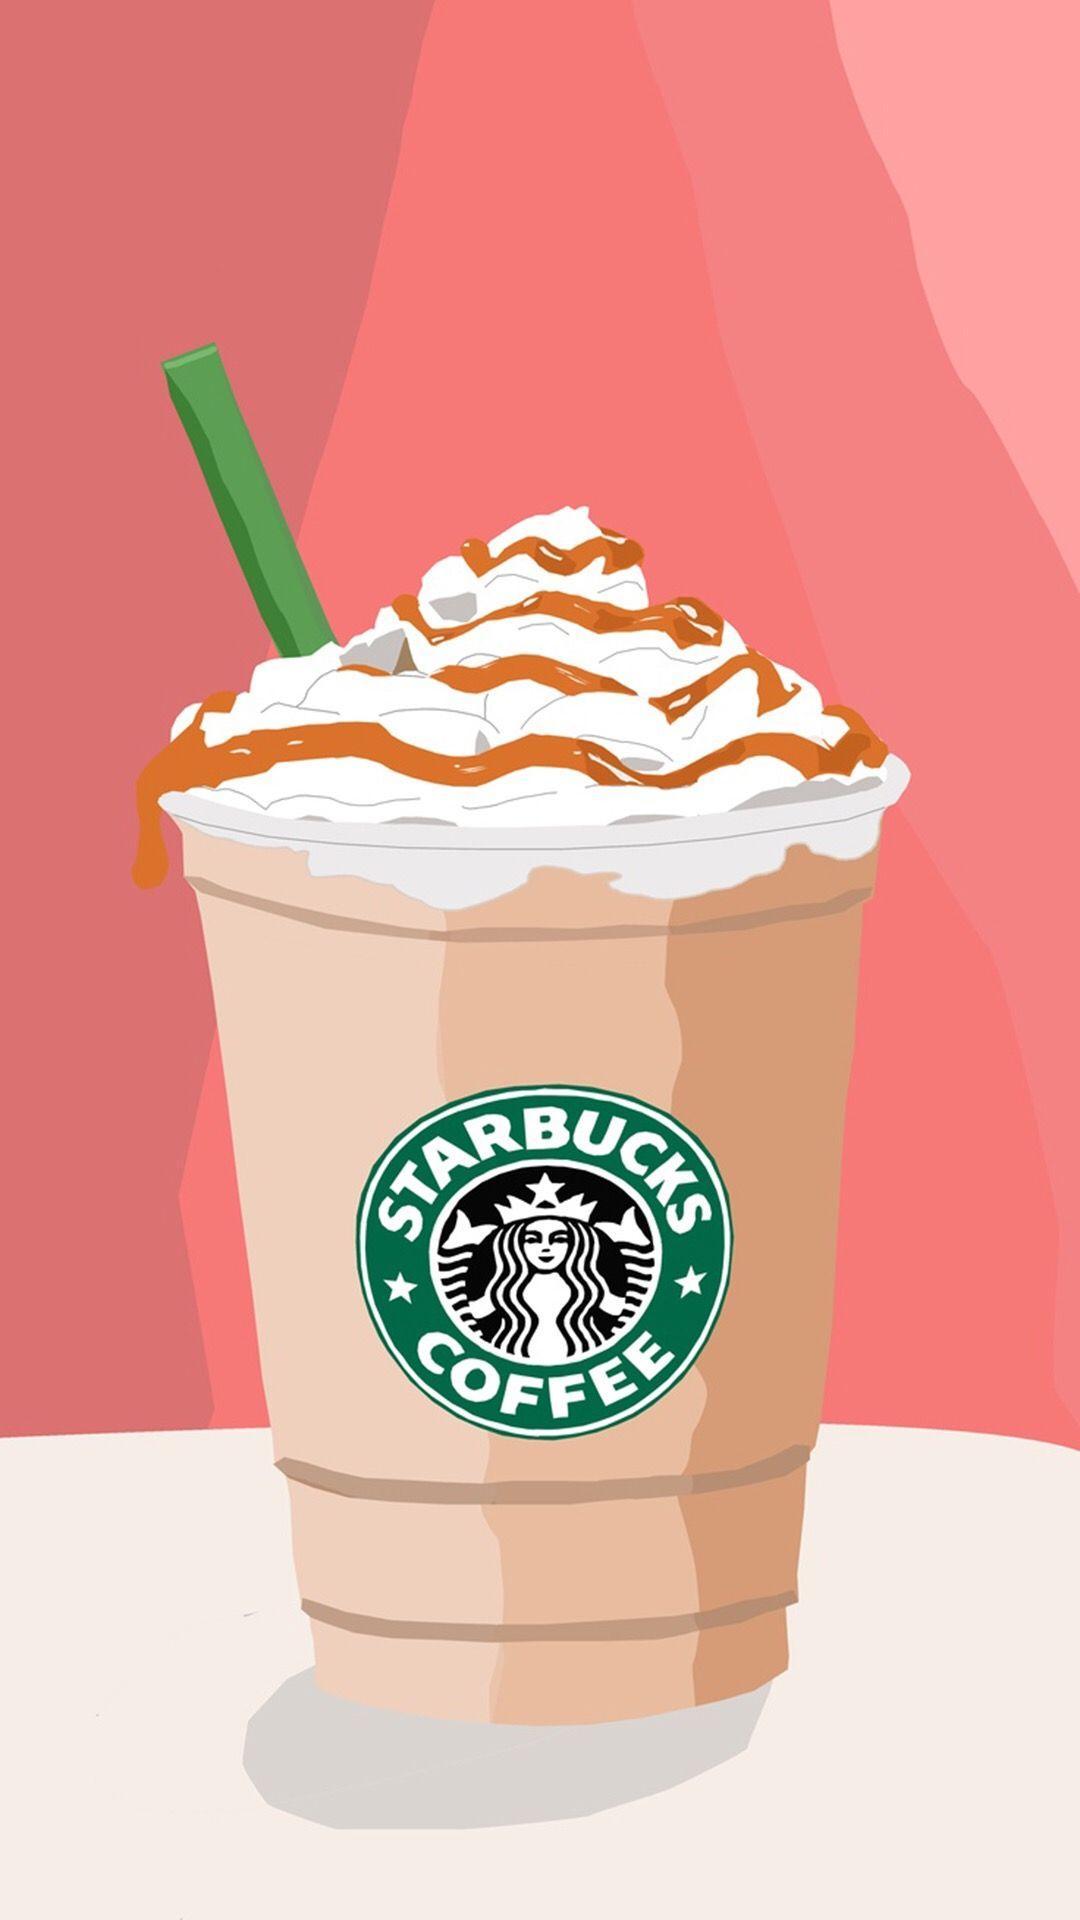 Starbucks Drinks Wallpapers Wallpaper Cave